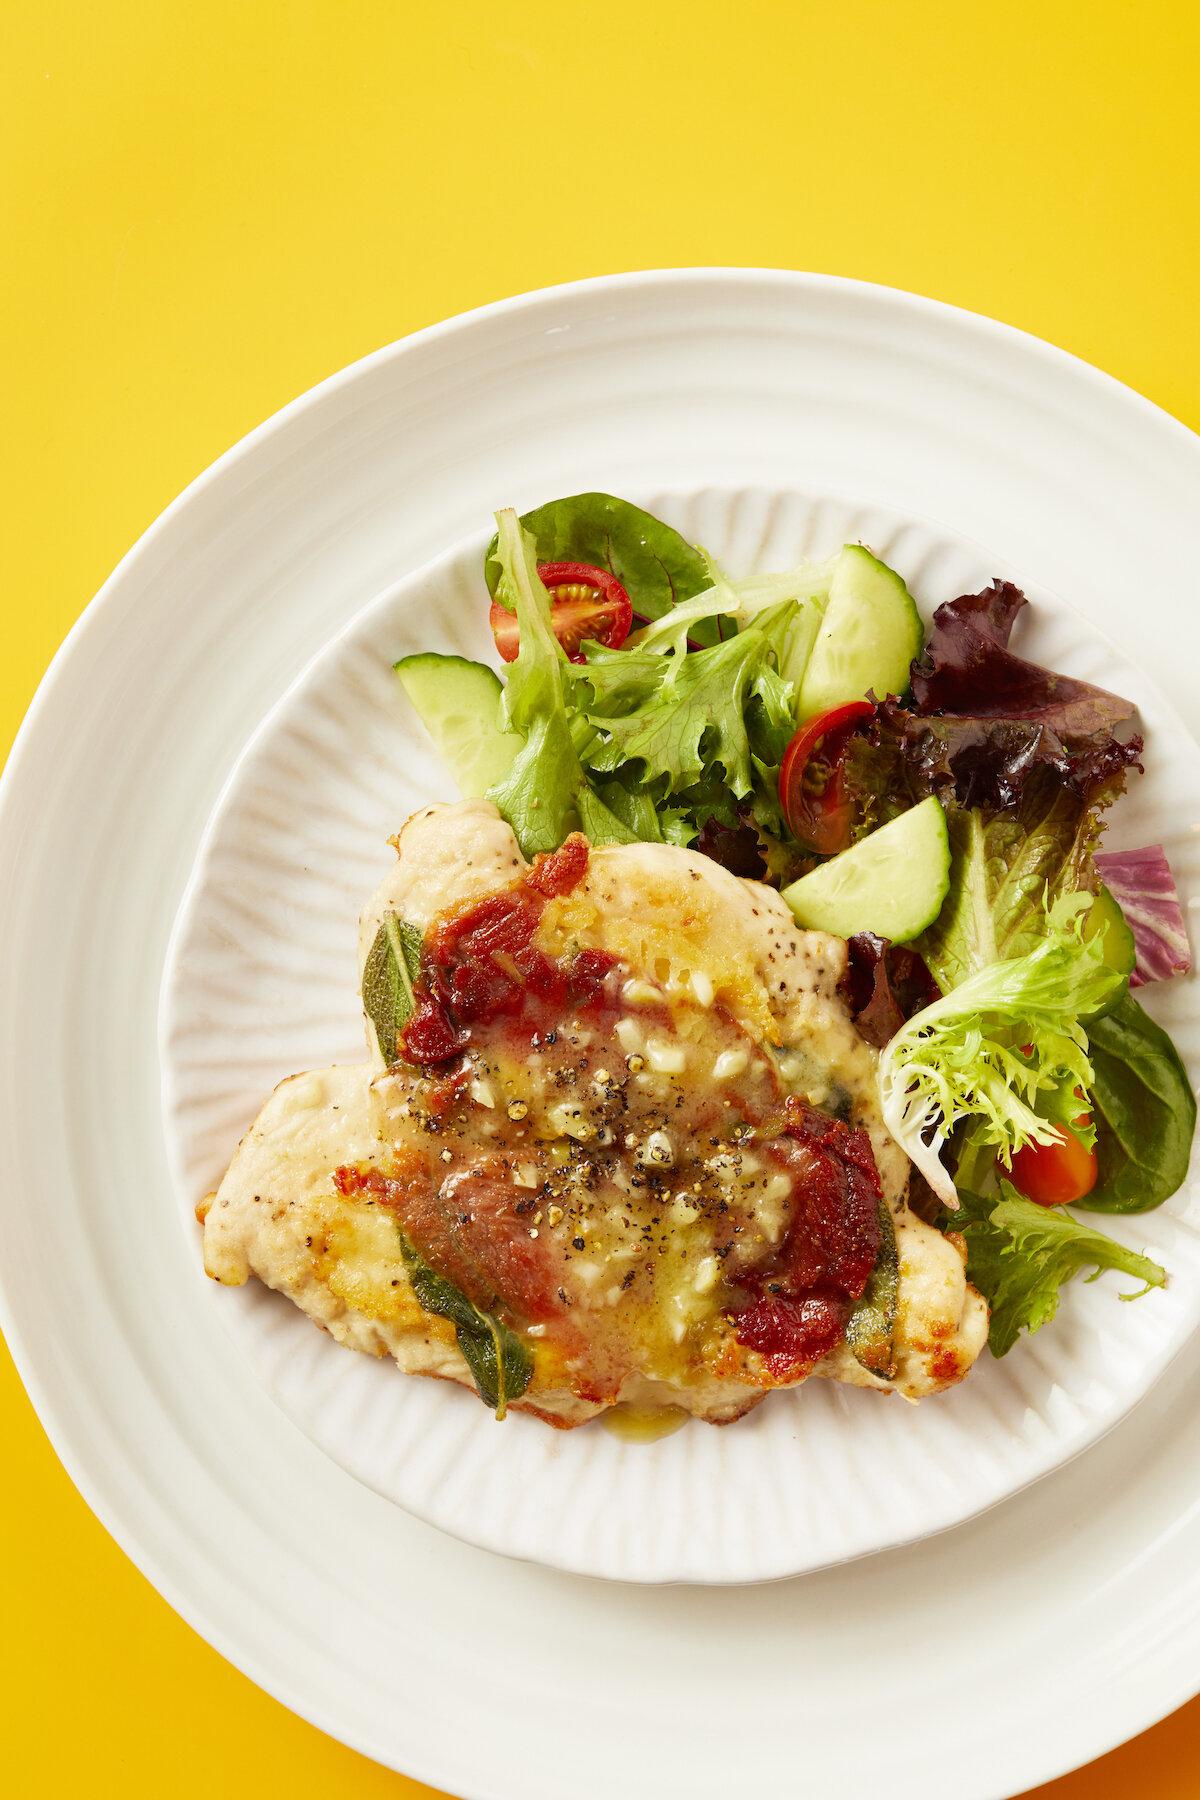 Chicken Saltimbocca from Winner! Winner! Chicken Dinner by Stacie Billis | Didn't I Just Feed You podcast